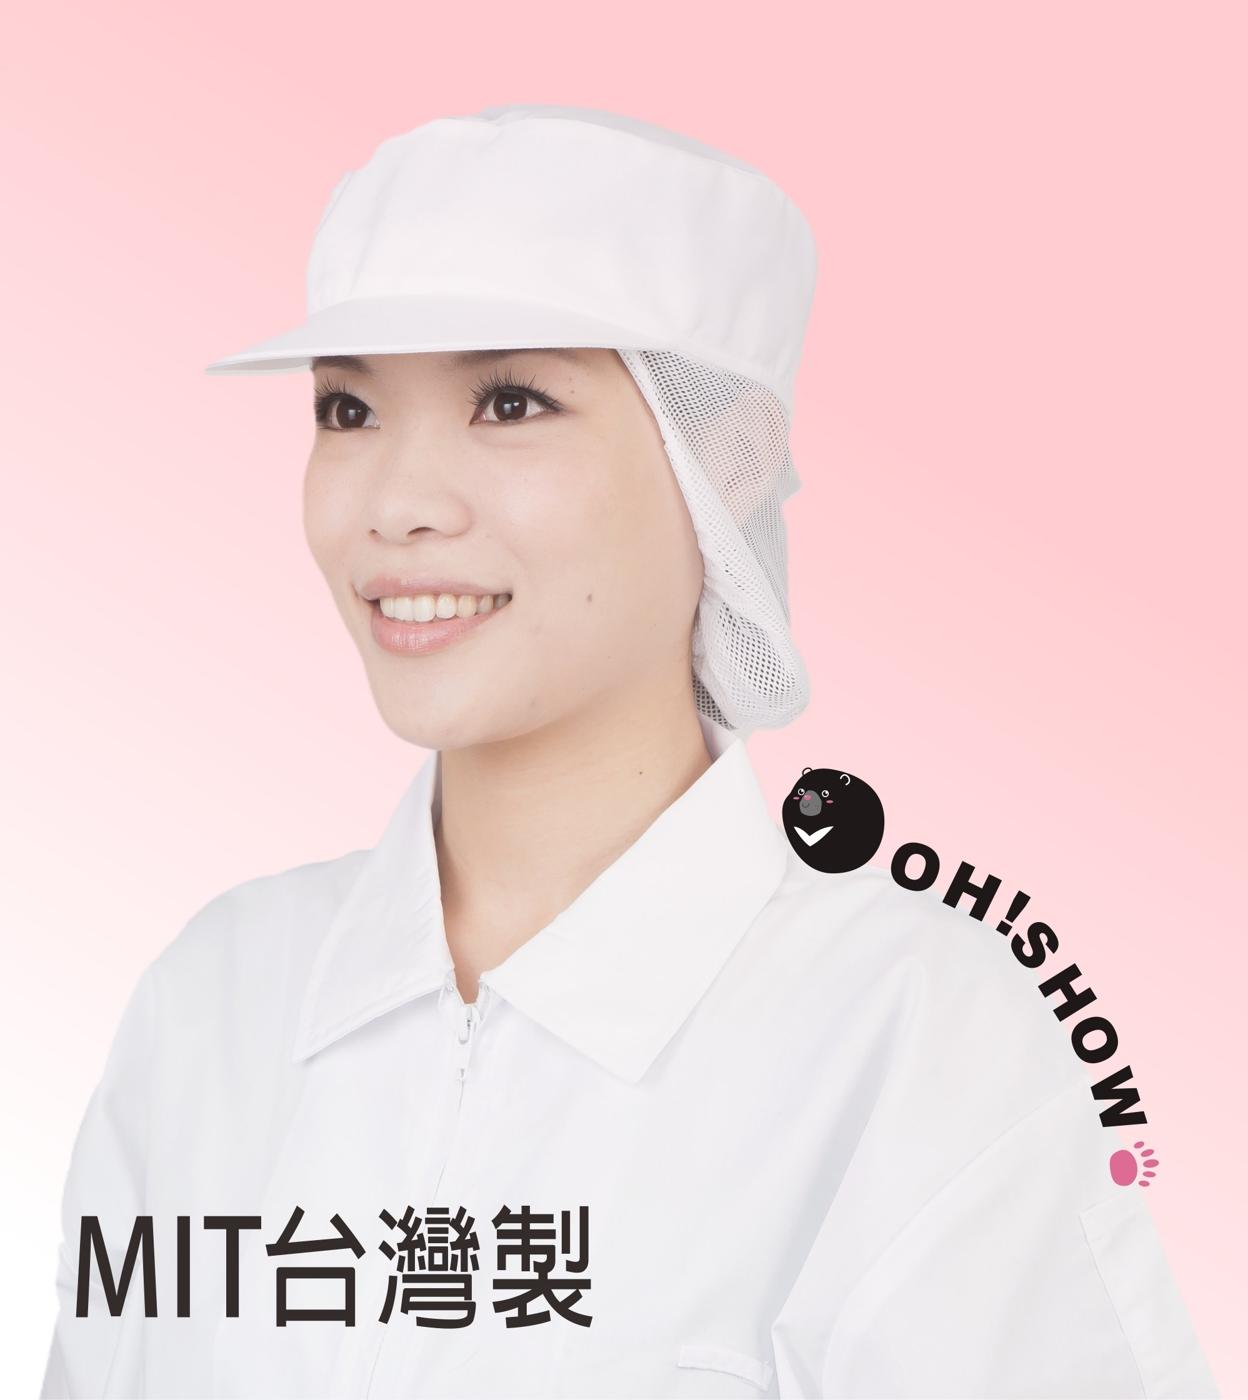 [OHShow]《 衛生帽 》食品帽/衛生帽/無塵室/廚師帽/工作帽